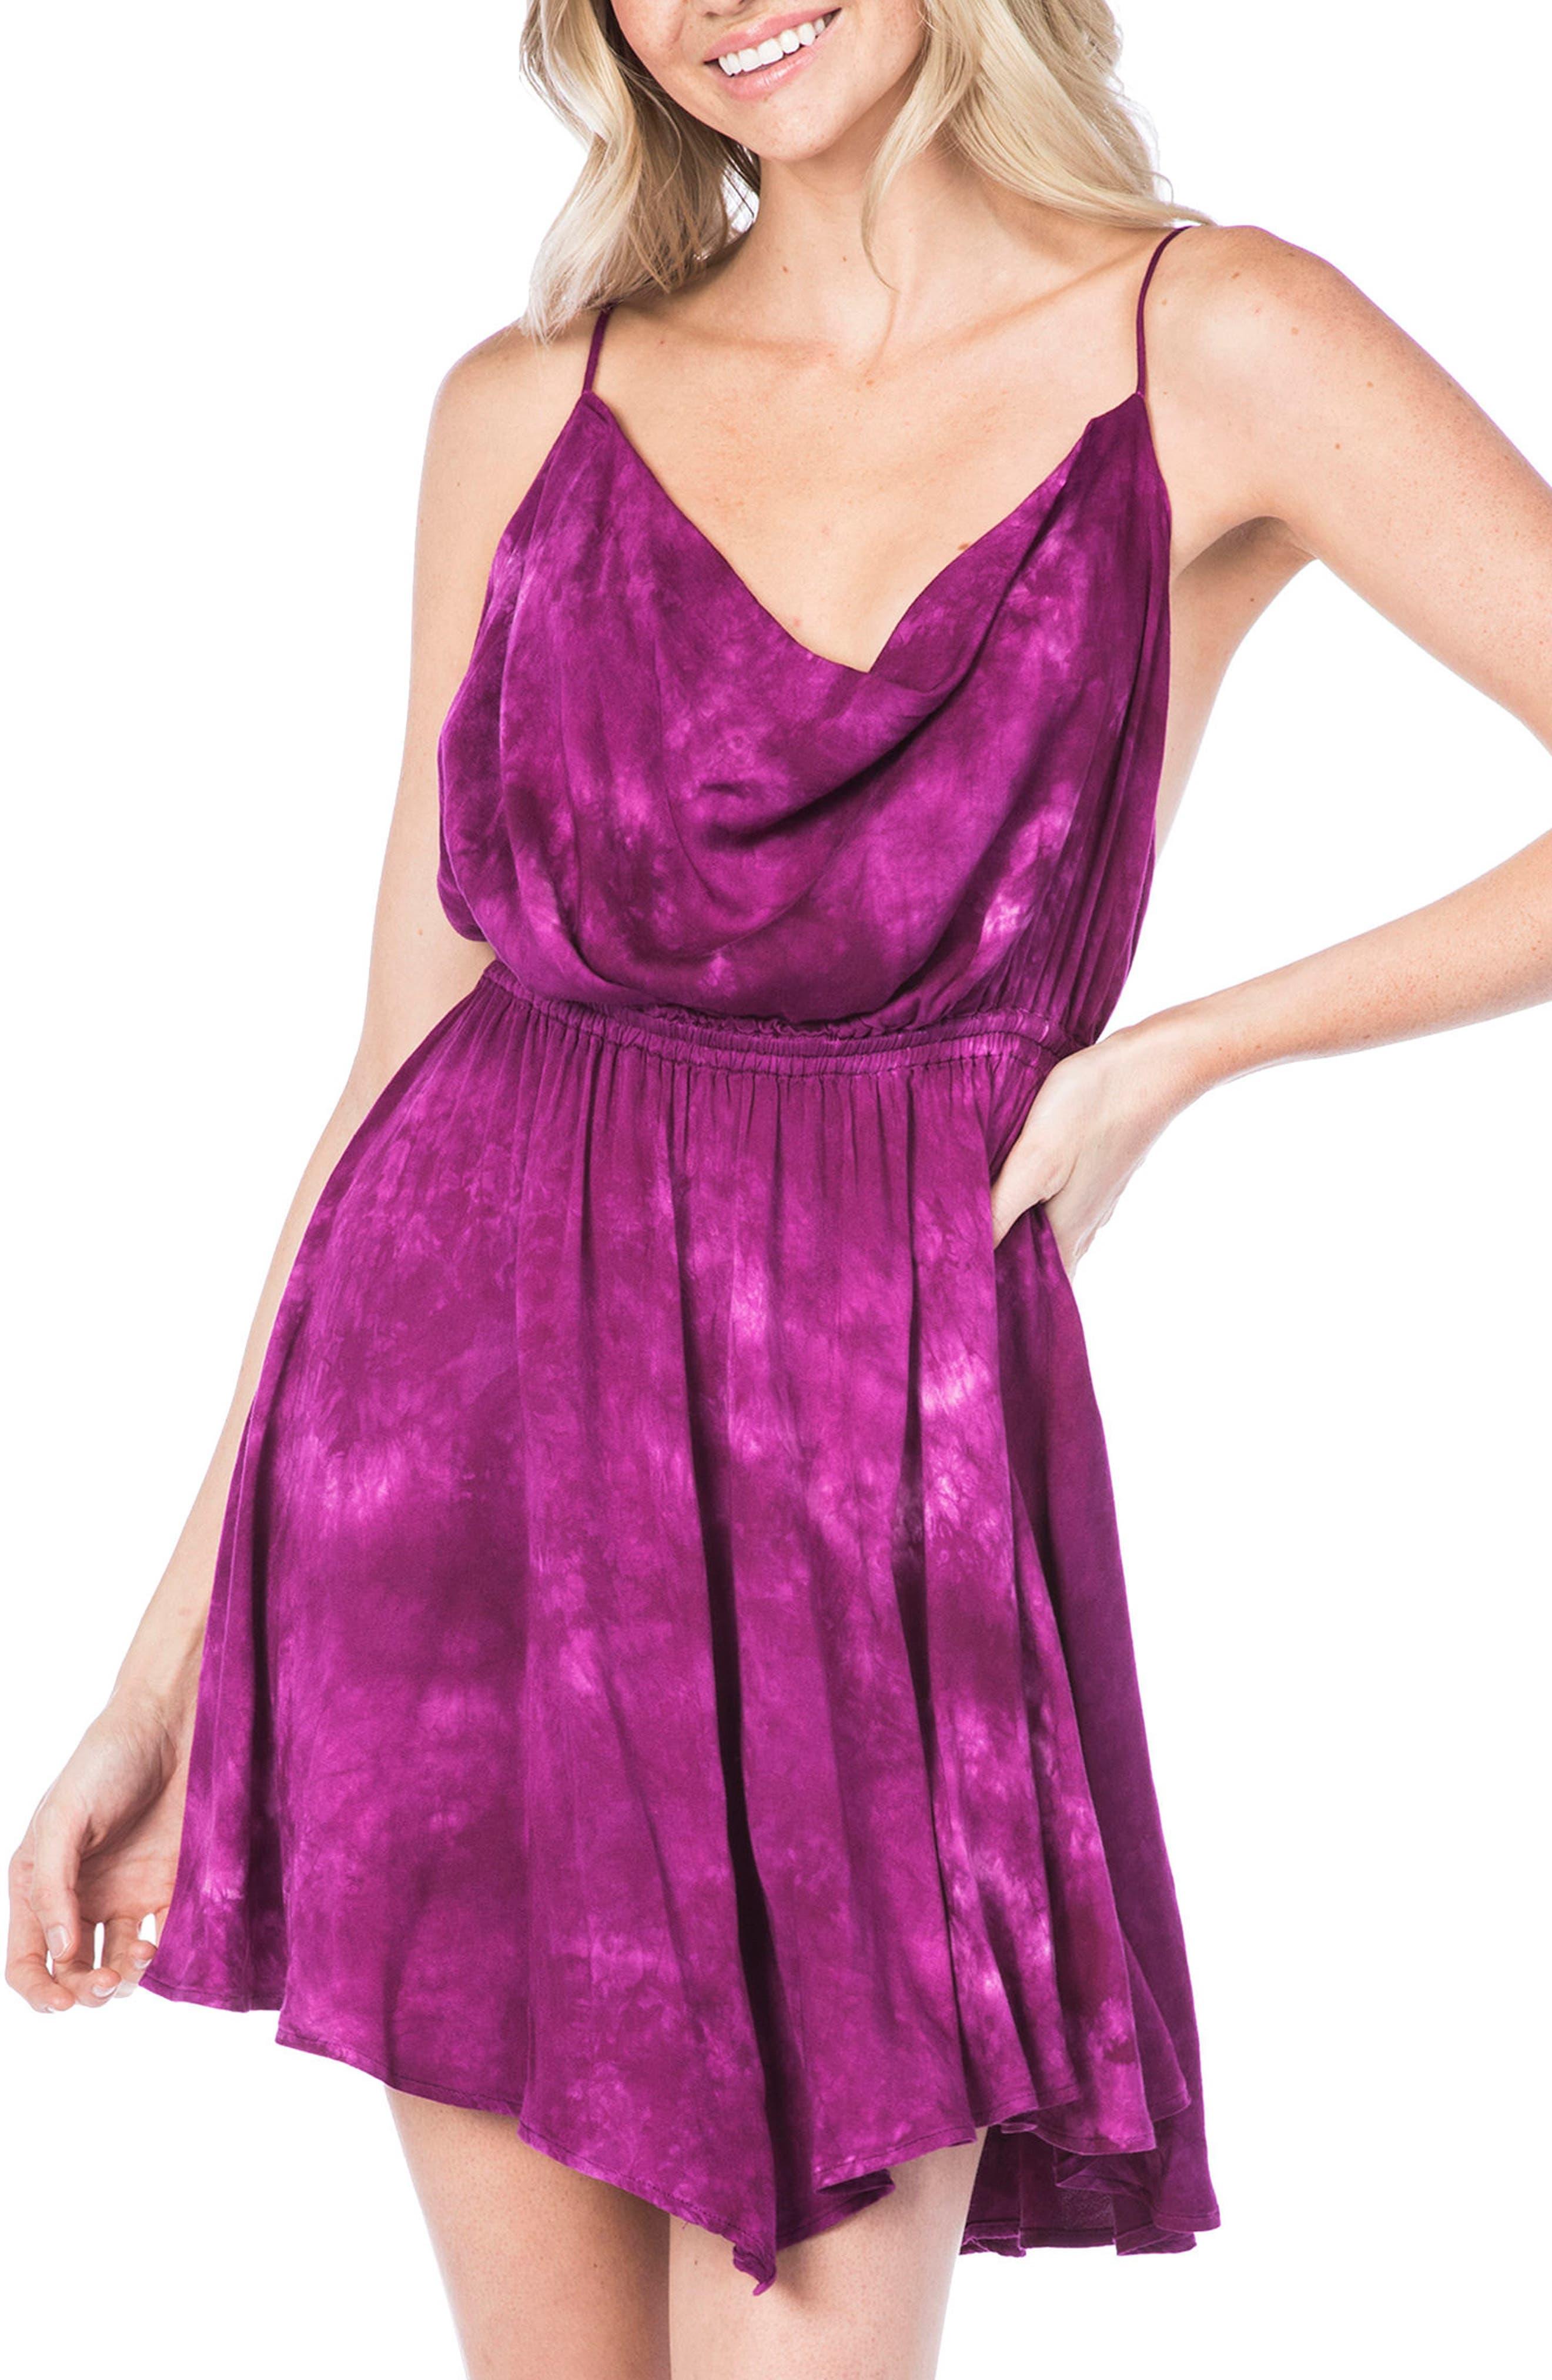 Negril Cowl Neck Cover-Up Dress,                             Main thumbnail 1, color,                             653